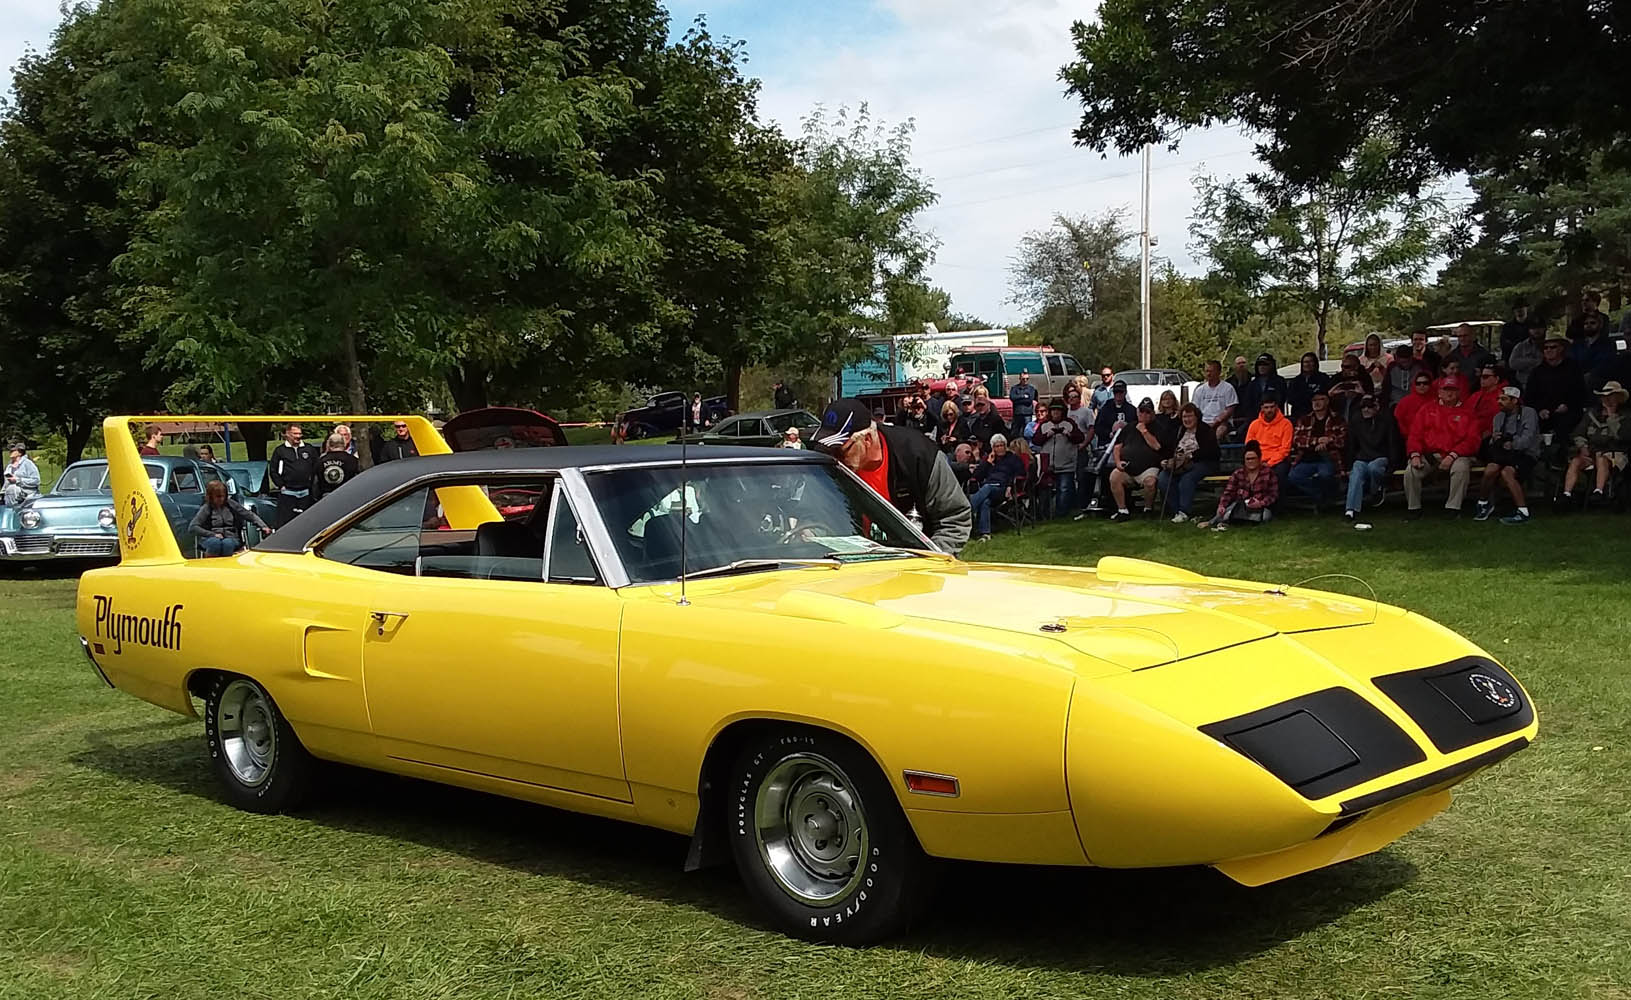 Top 25- 1970 Plymouth Super Bird, Bob Glaspie 1